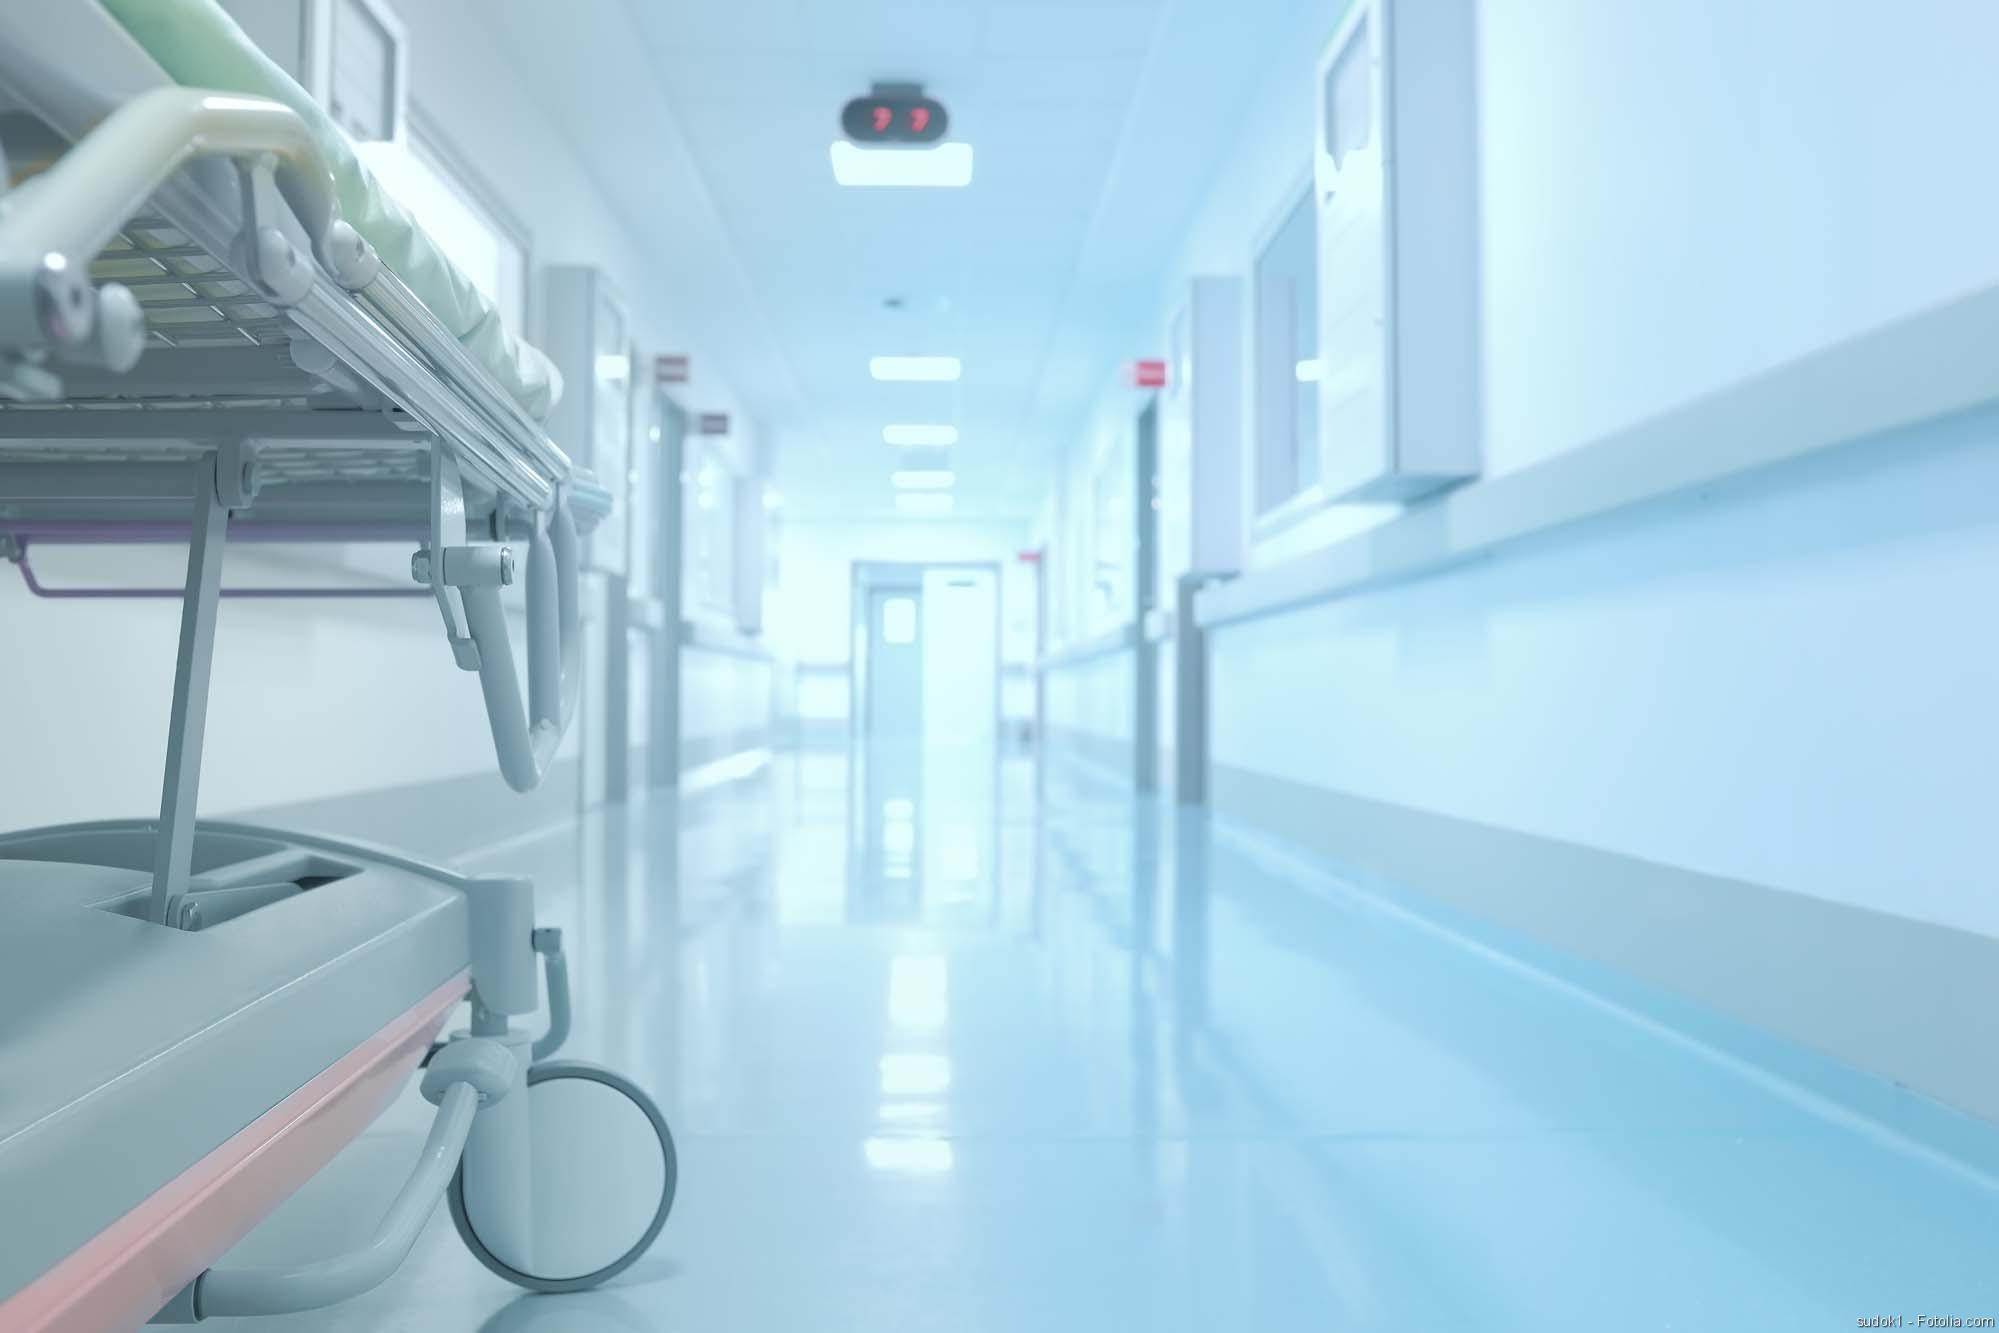 Antibiotikaresistente Keime bekämpfen, Hodentumoren, Klinik, Klinikarzt, Patient, Burnout, Klinikflur